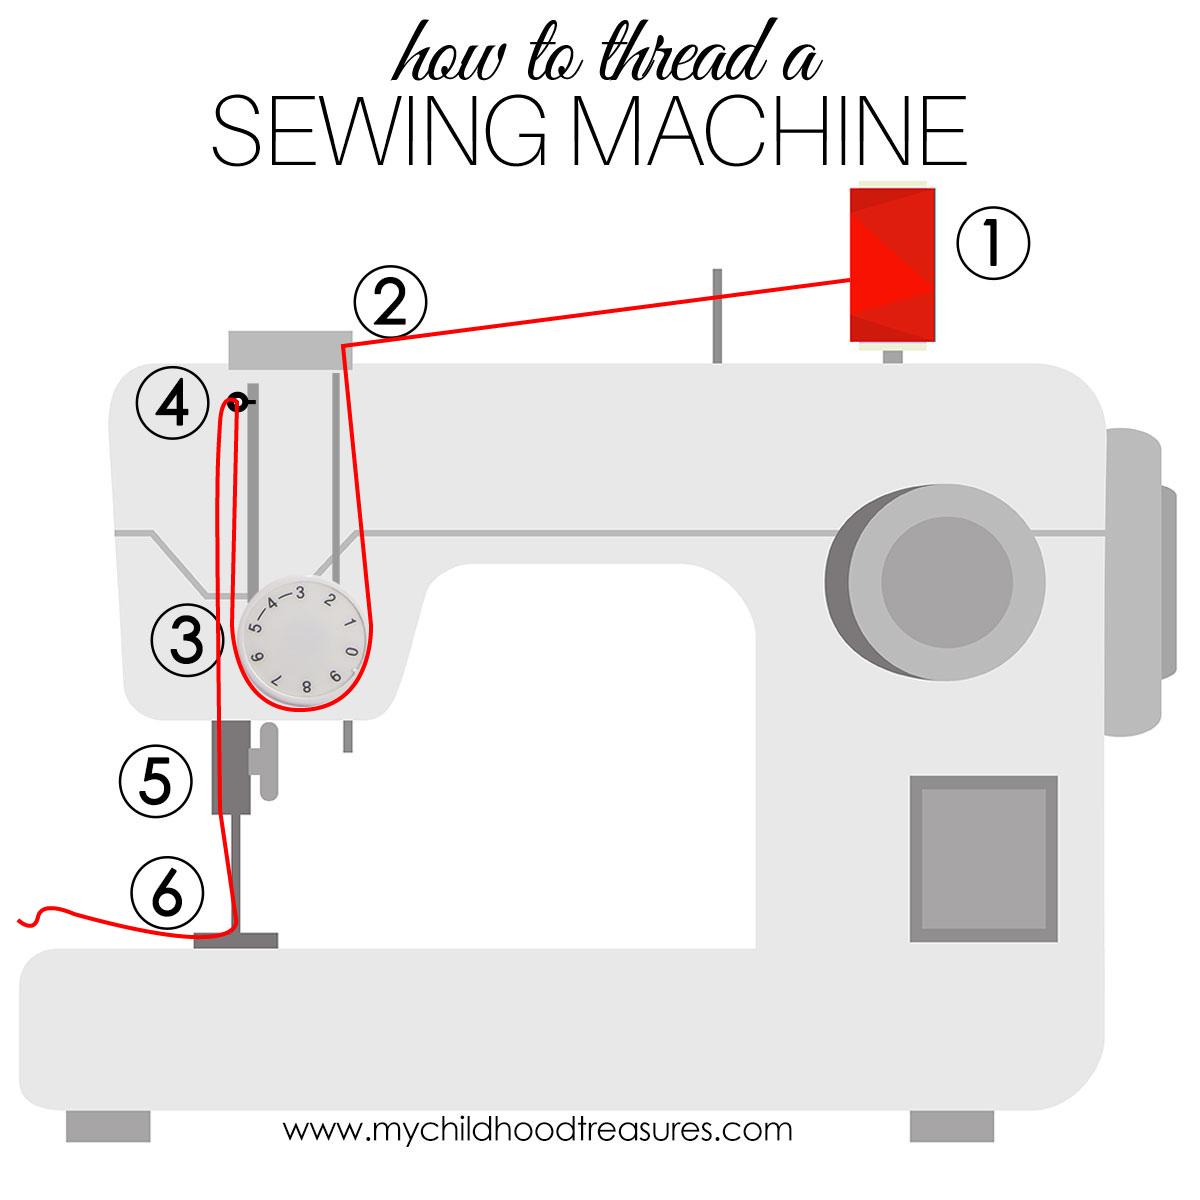 Thread Sewing Machine Diagram Wiring Online Atlas Threading How To A Easy Step By Tutorial Treasurie Schematics